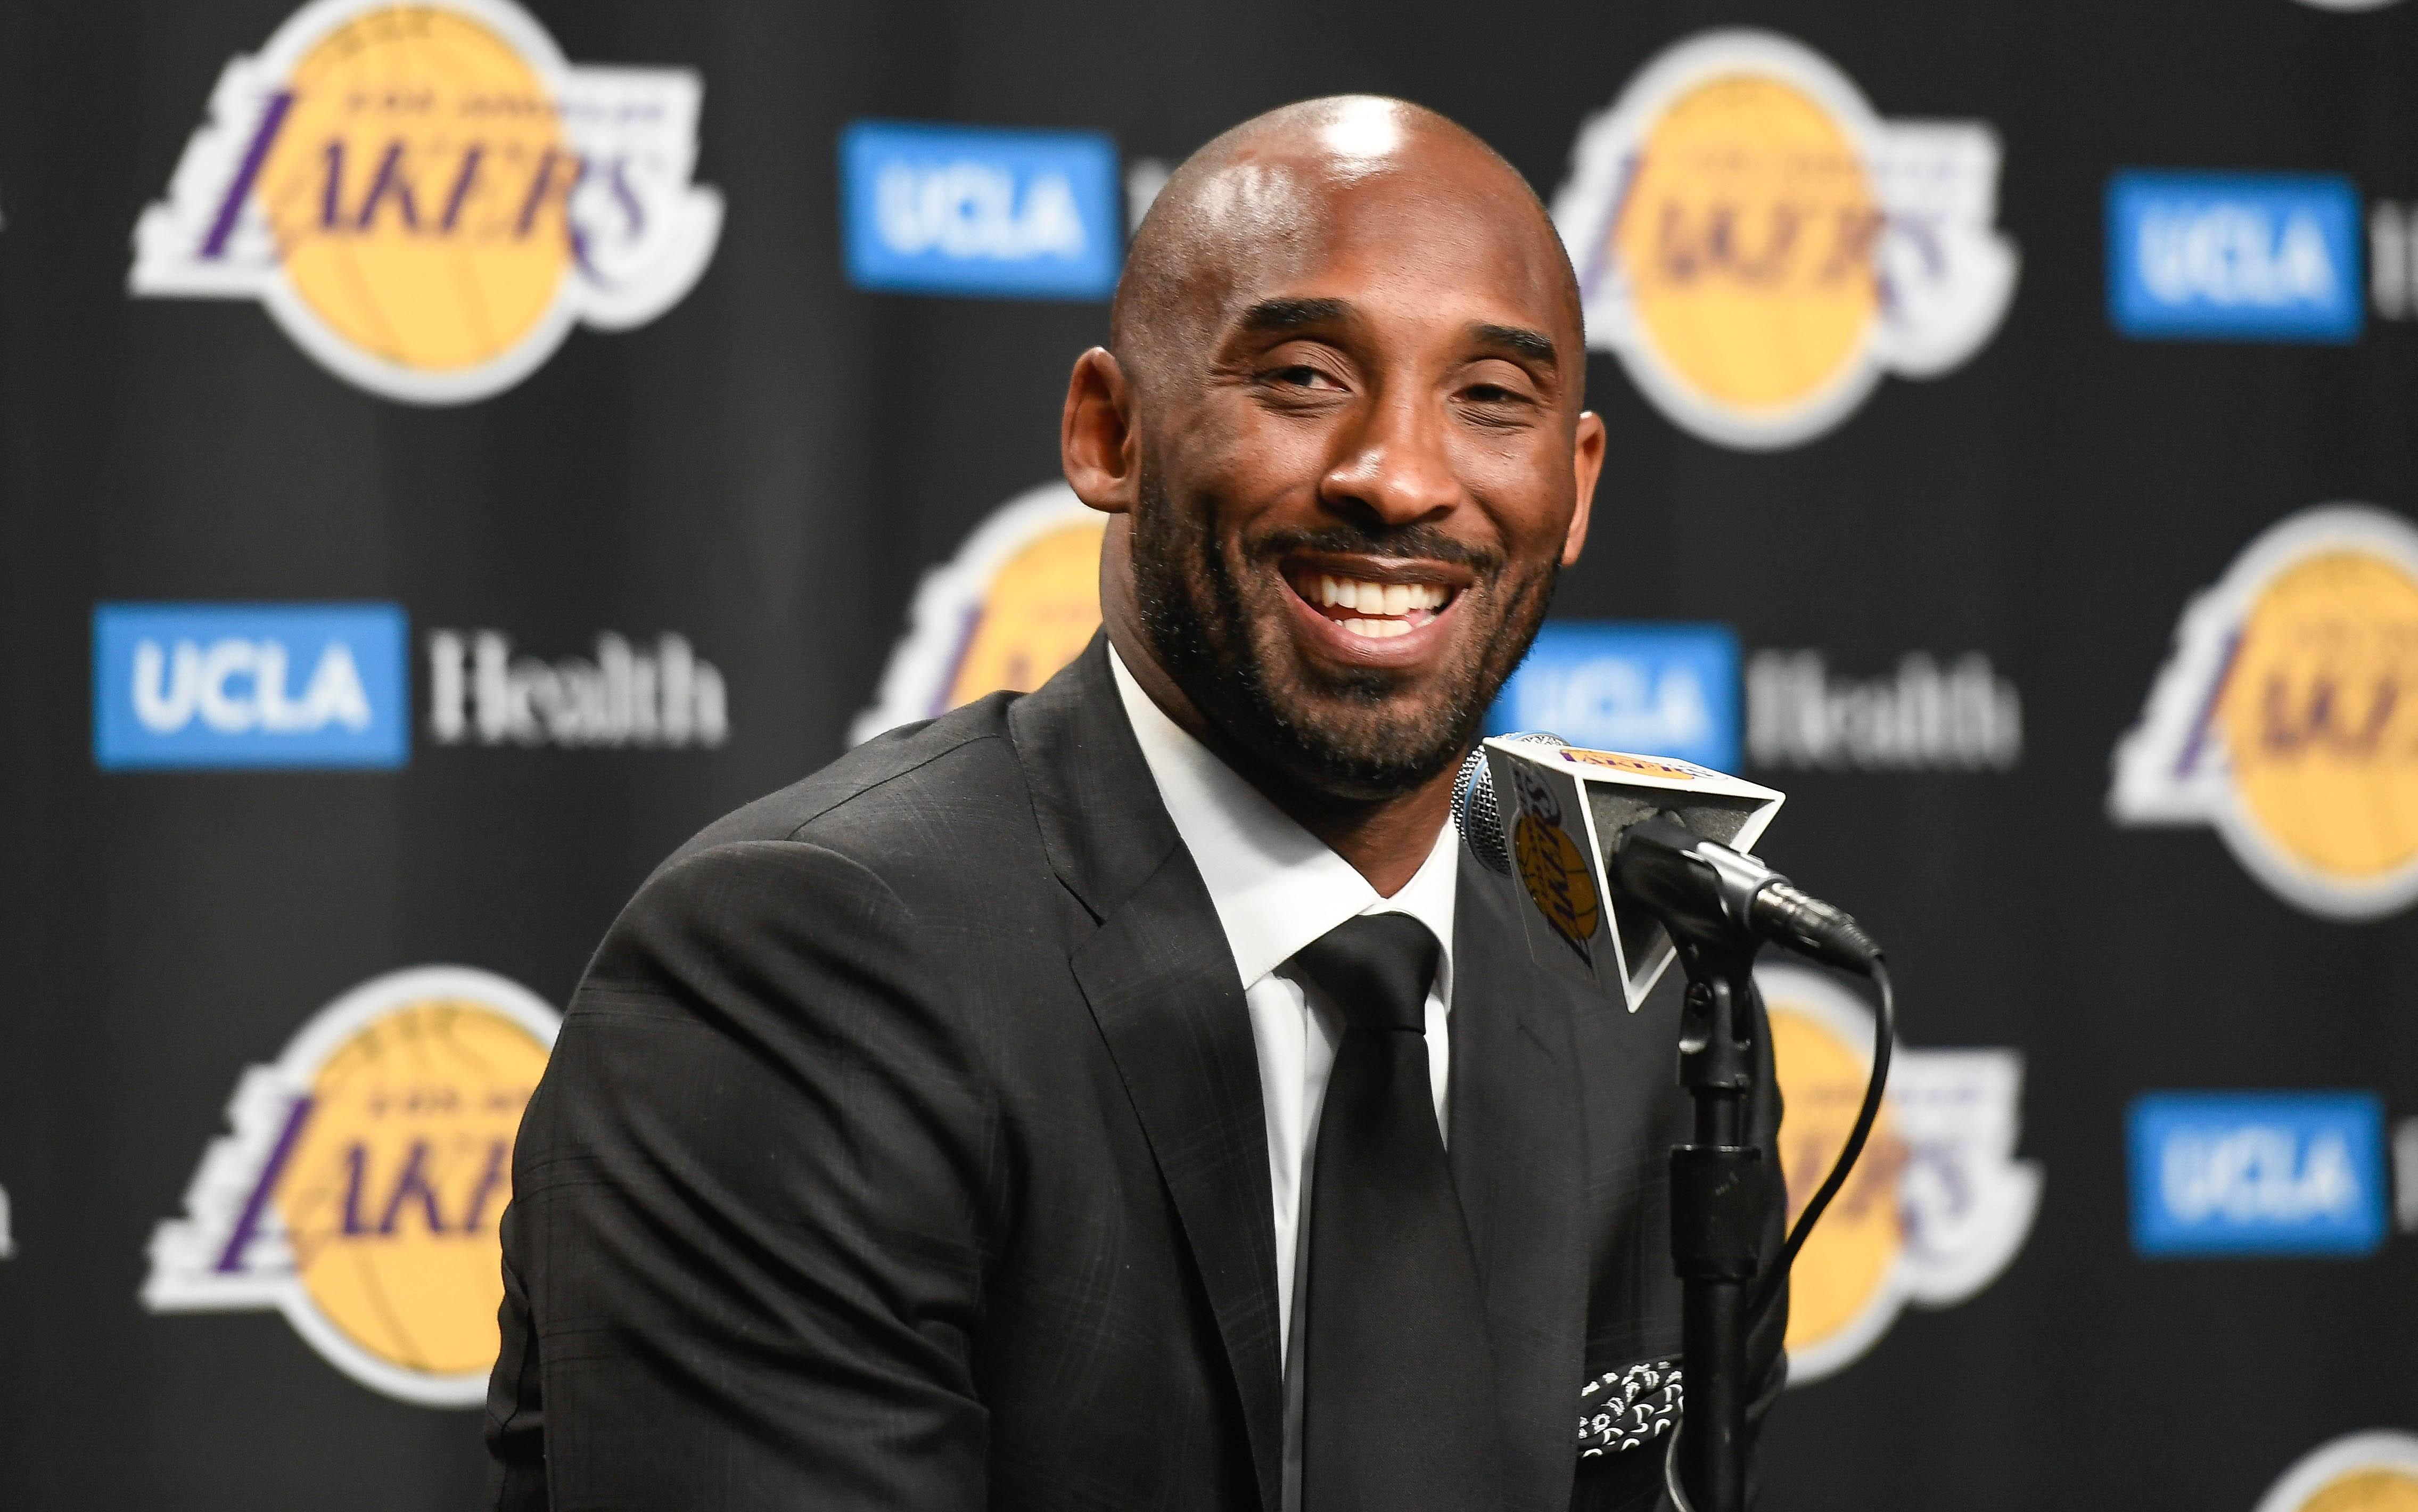 Watch Kobe's profane reaction to Eagles winning Super Bowl